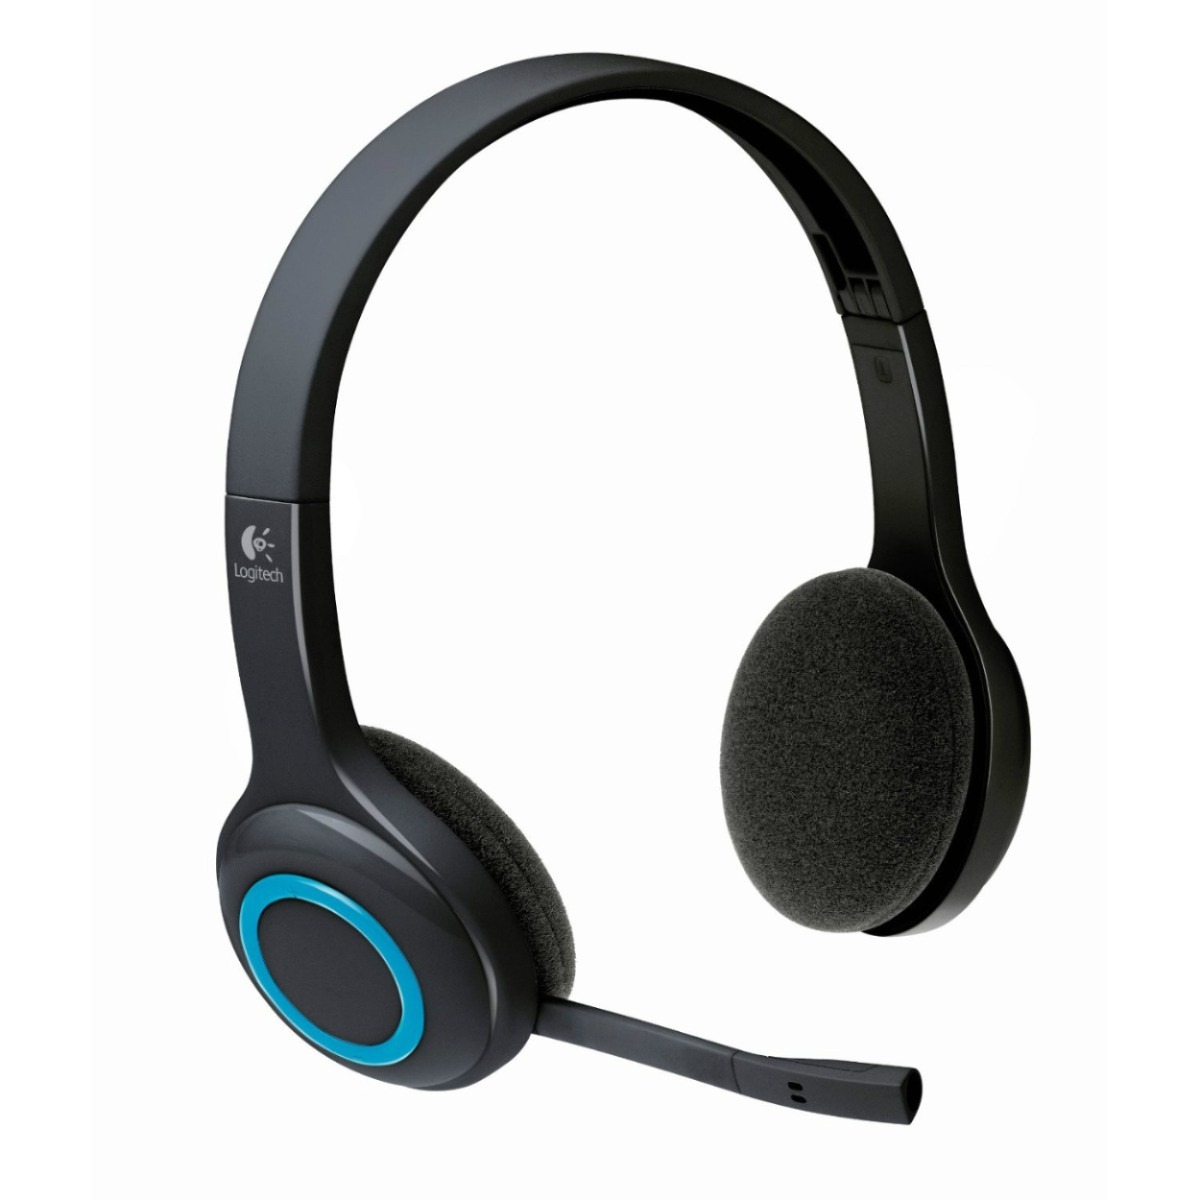 audifonos inalambricos para pc con microfono